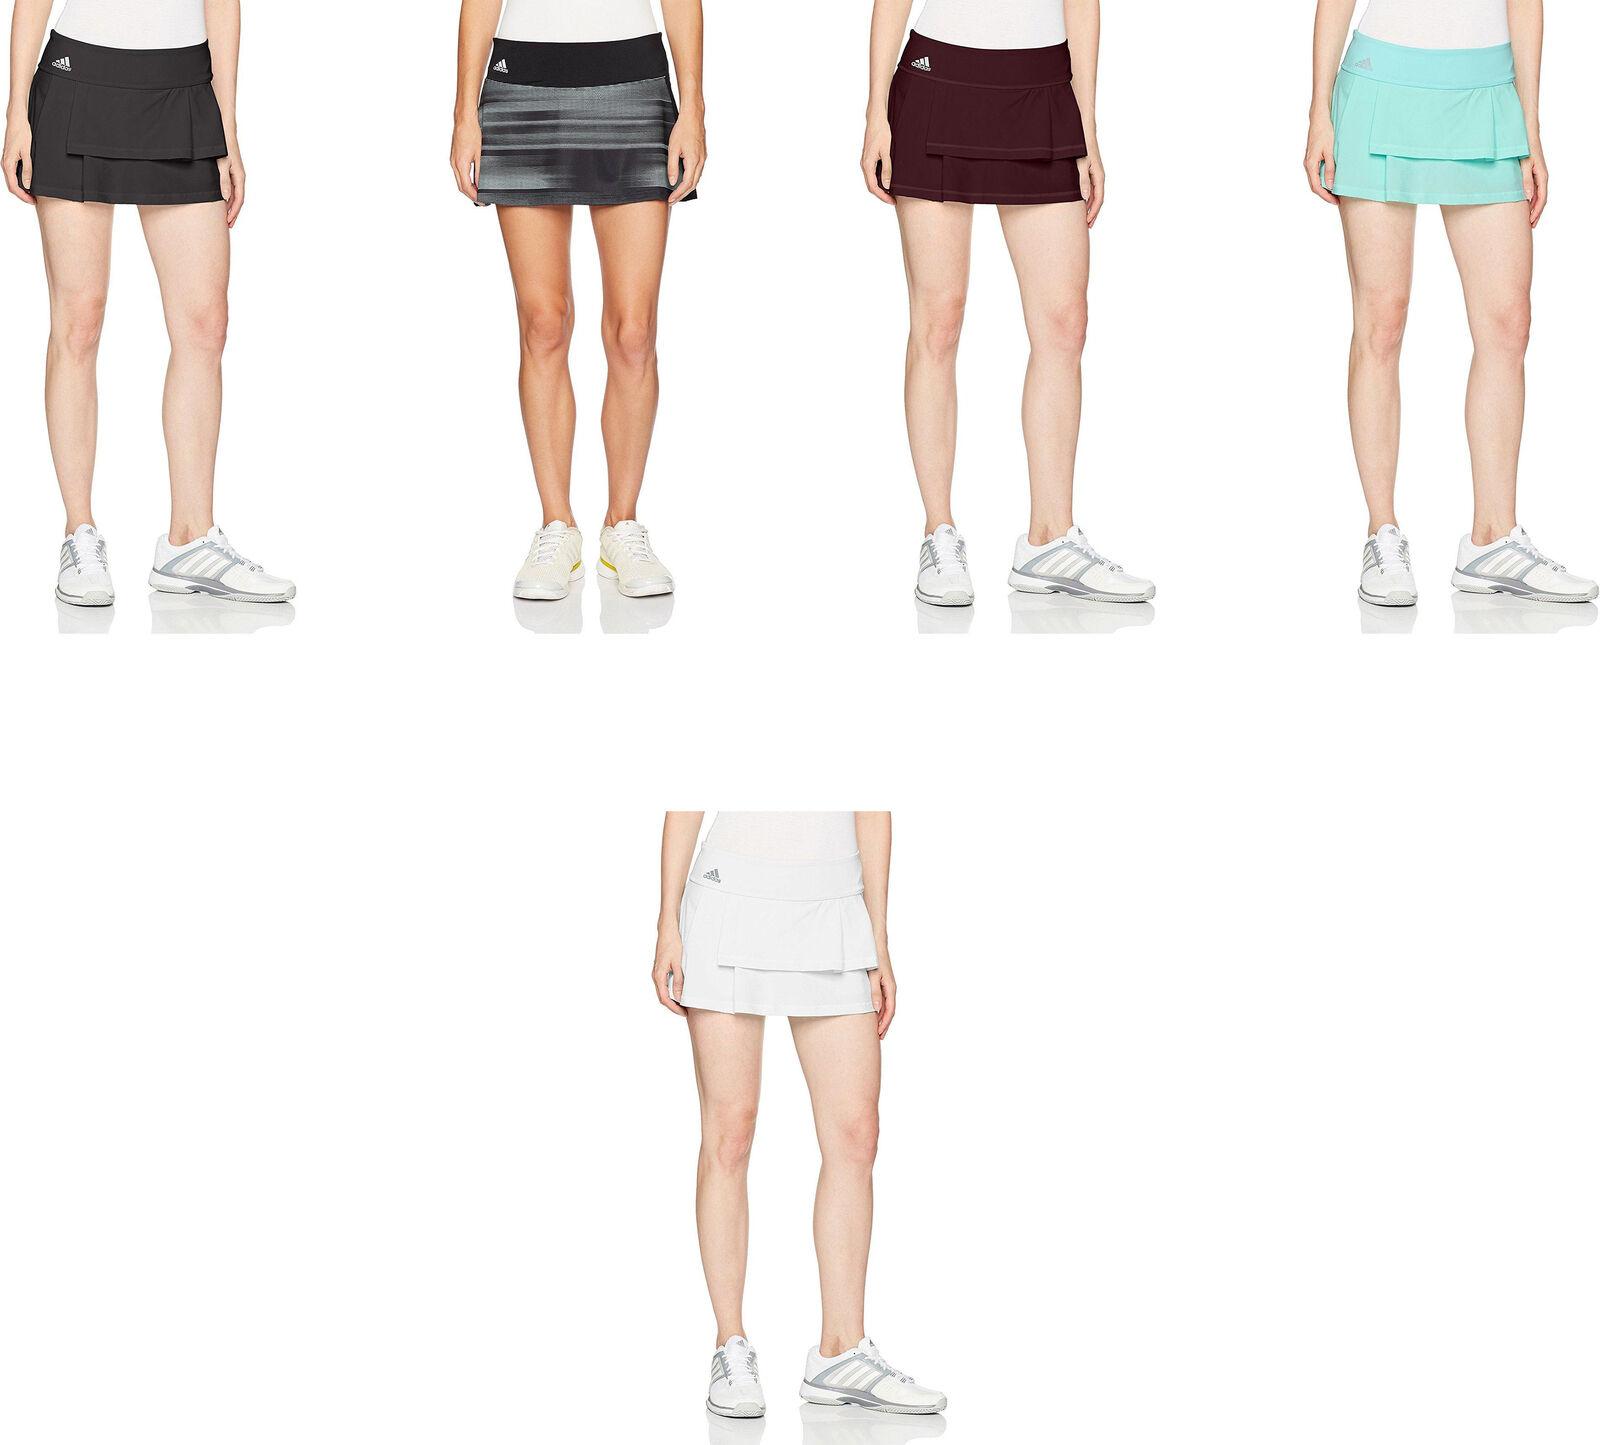 c50ab67964 adidas Women's Tennis Advantage Skirt, 5 Colors | eBay